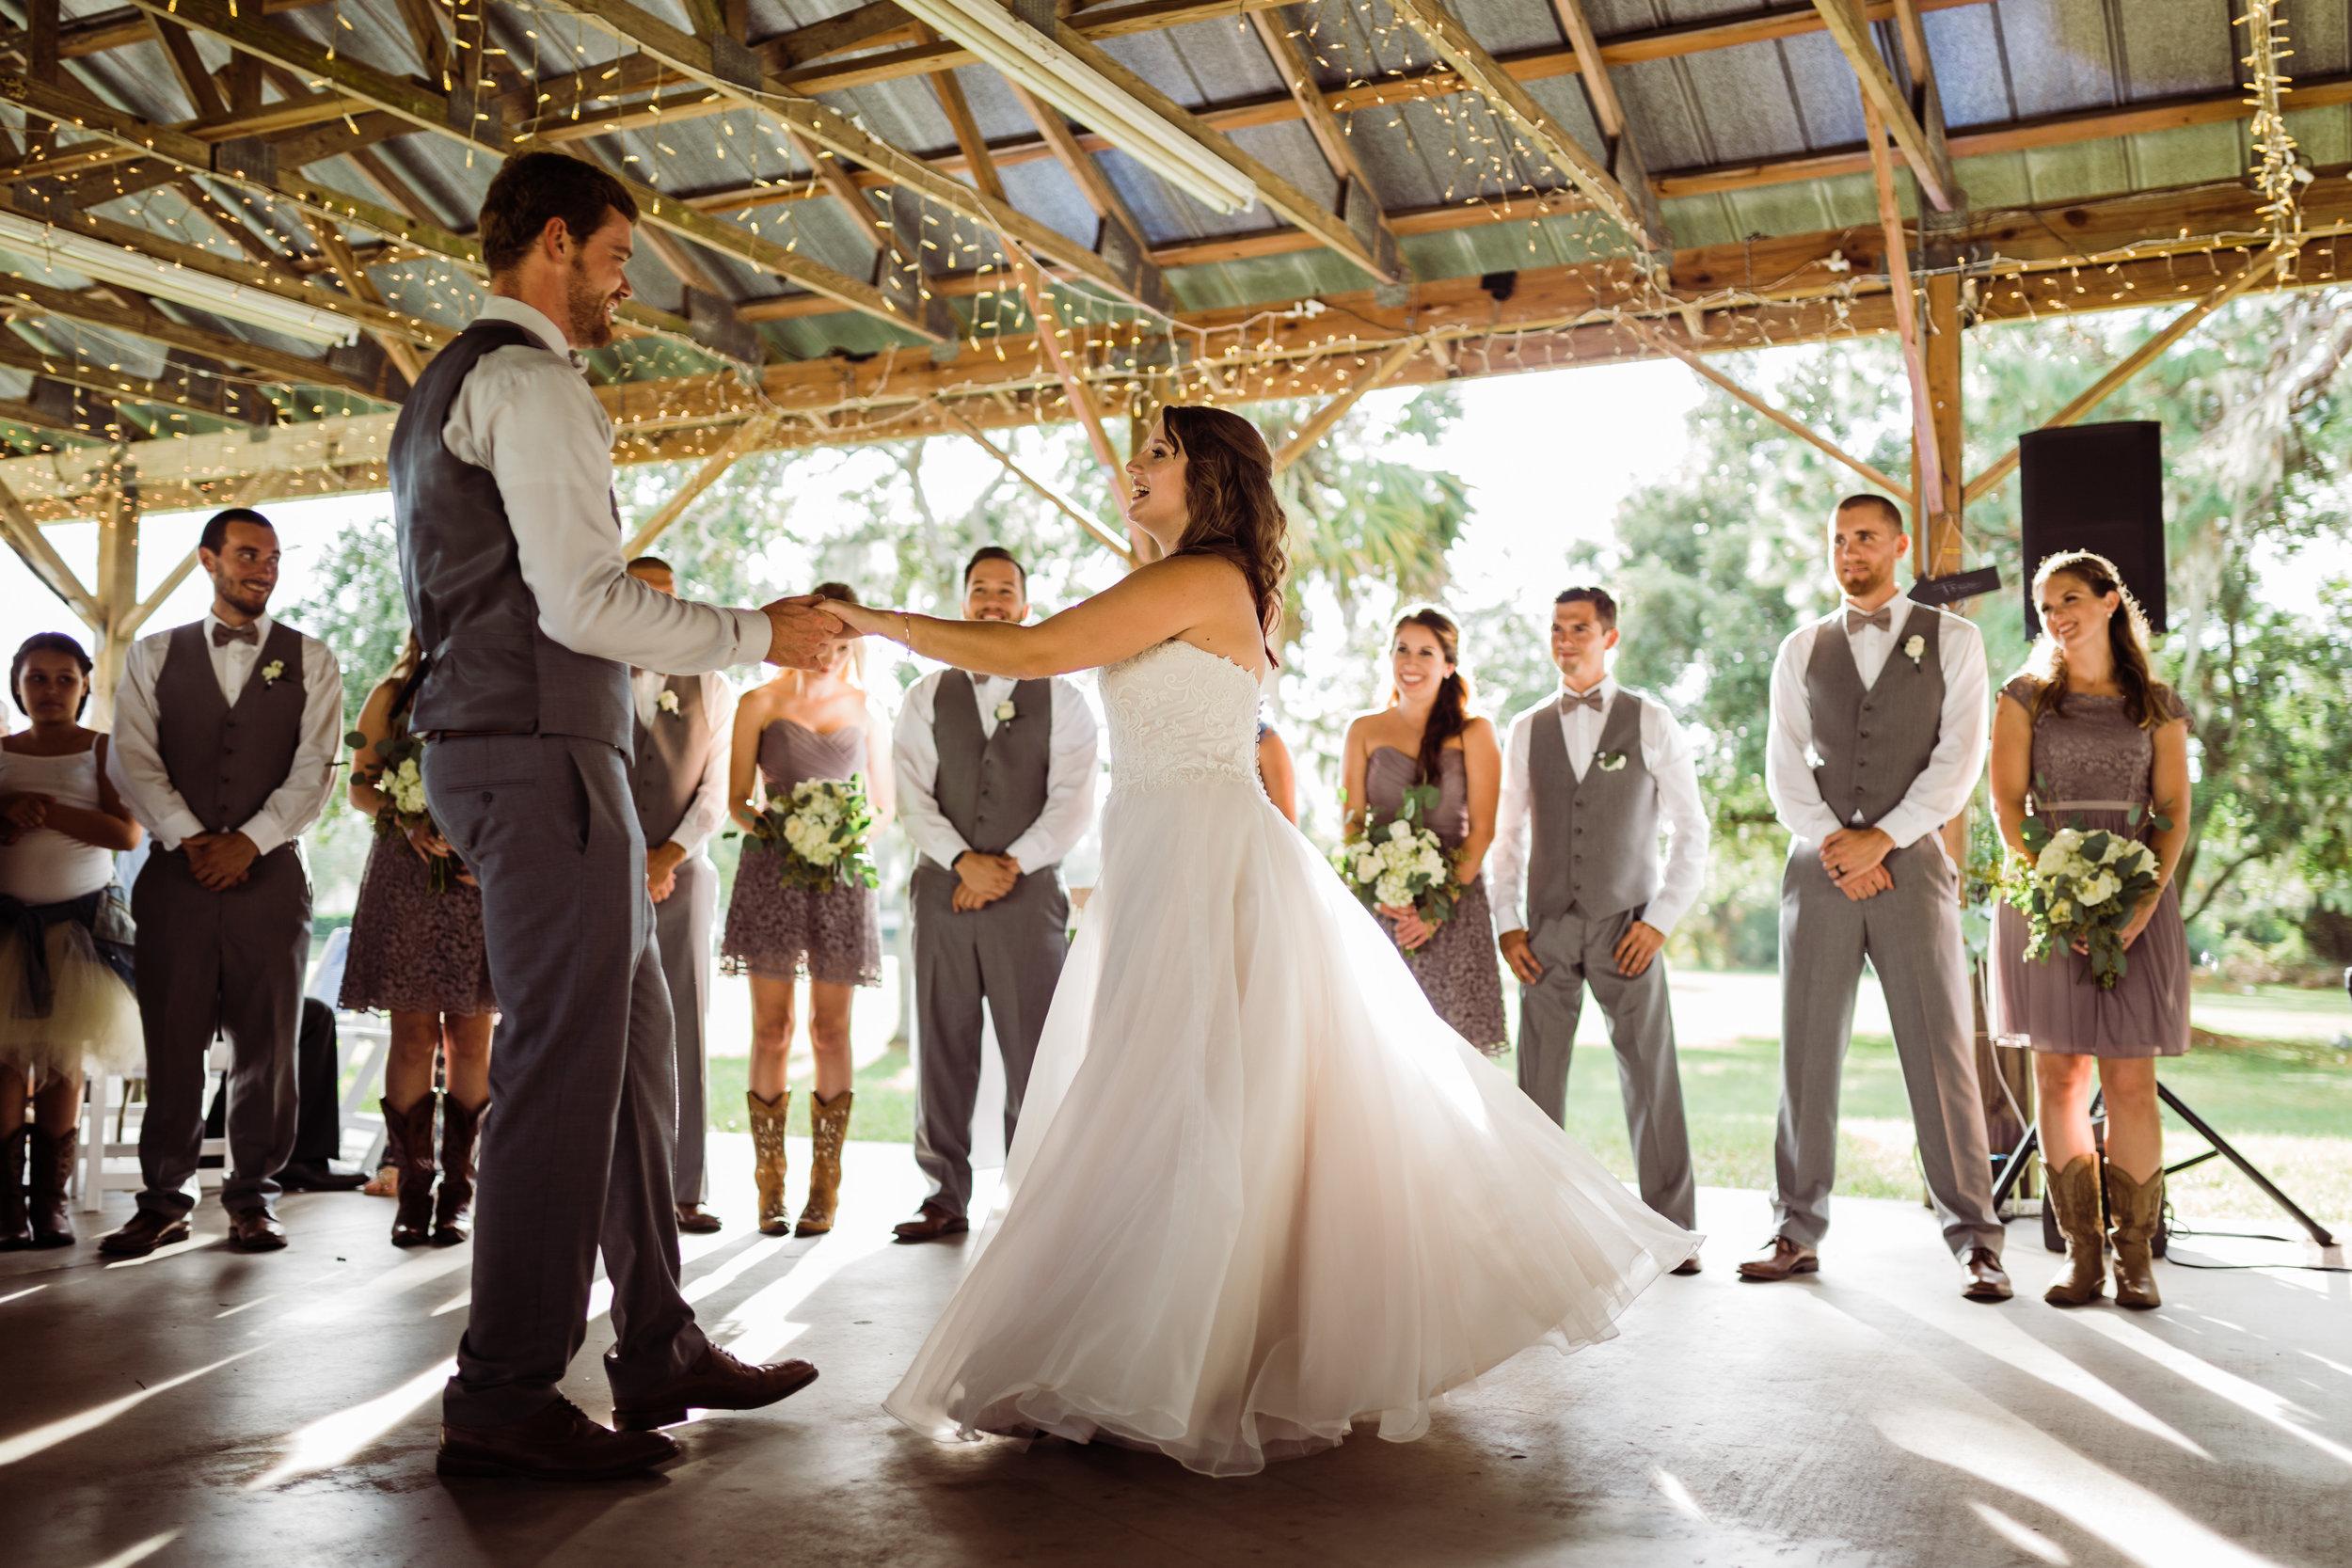 2017.10.14 Samantha and Matthew Crabtree Sarasota Wedding (455 of 708).jpg